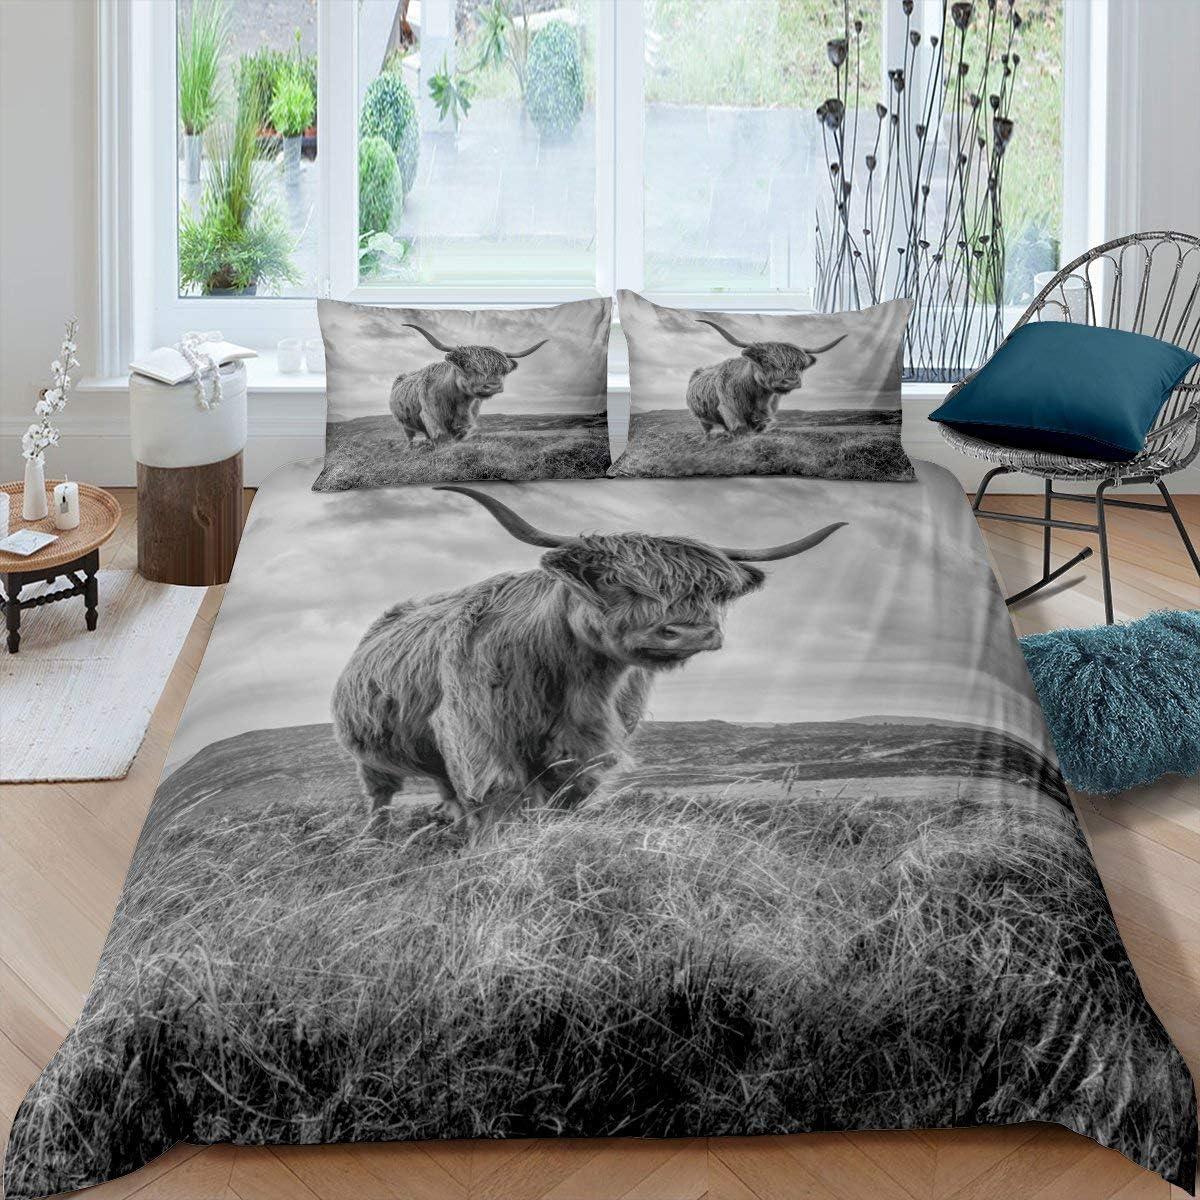 Erosebridal Recommended Highland low-pricing Cow Bedding Set Cove Size King Duvet Cattle